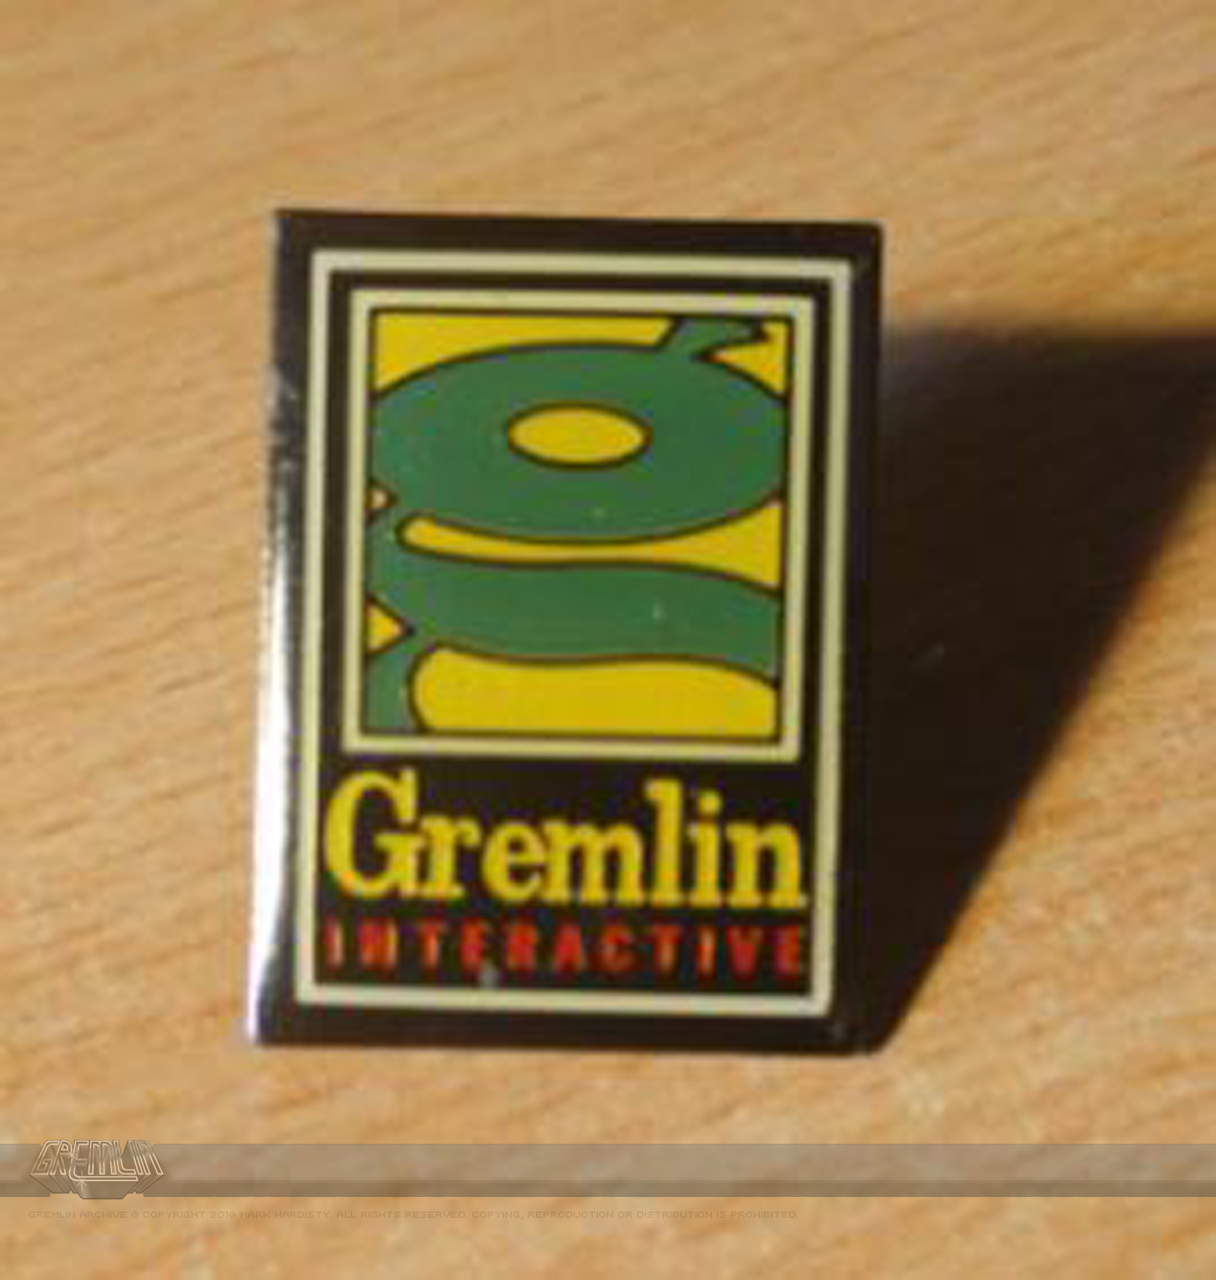 Gremlin lapel pin-badge